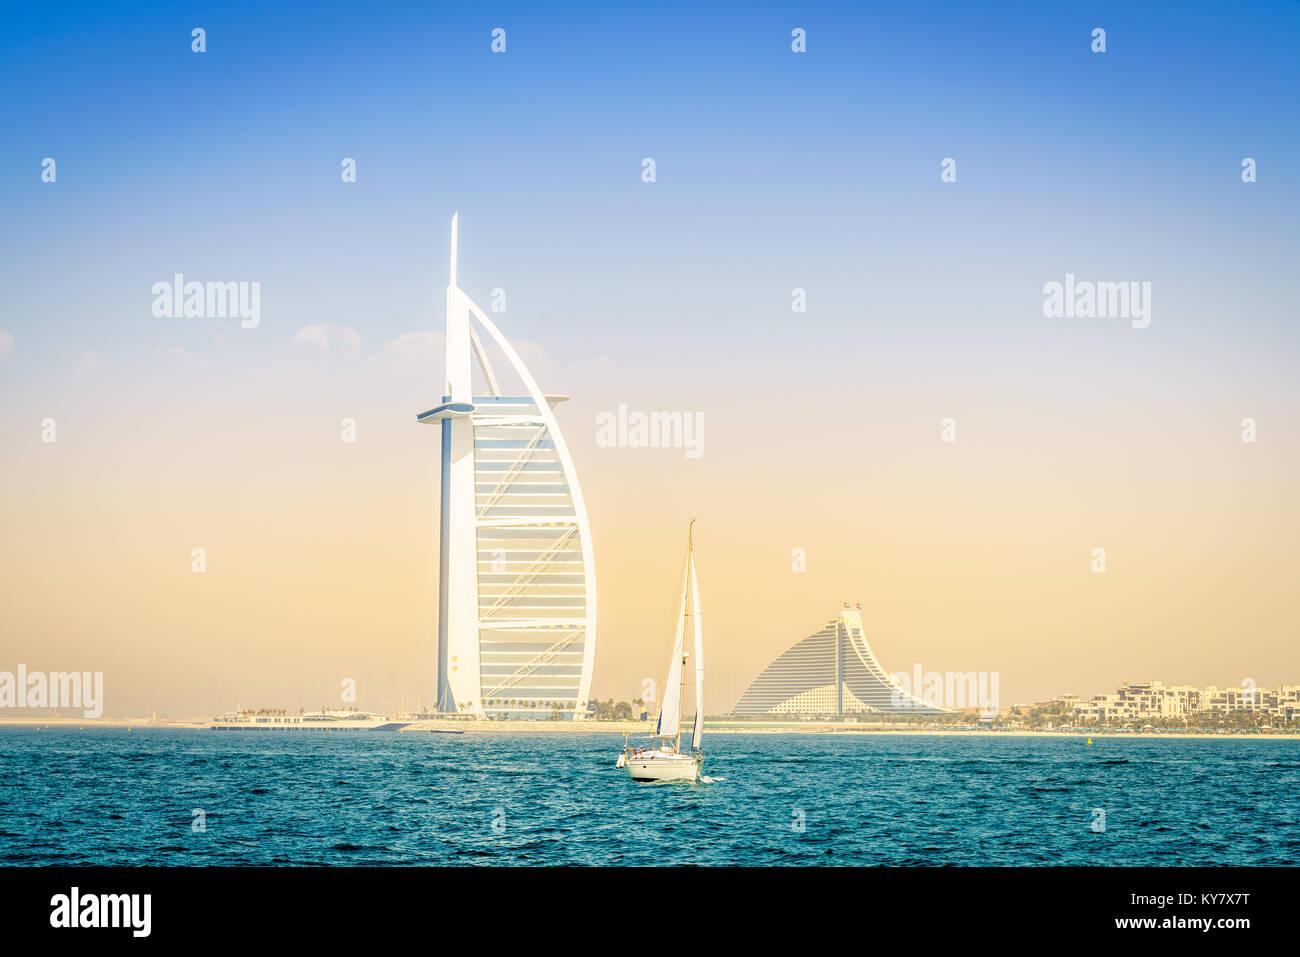 Dubai, Emiratos Árabes Unidos, 31 de marzo de 2017: vistas de la costa del mundialmente famoso Burj Al Arab Imagen De Stock